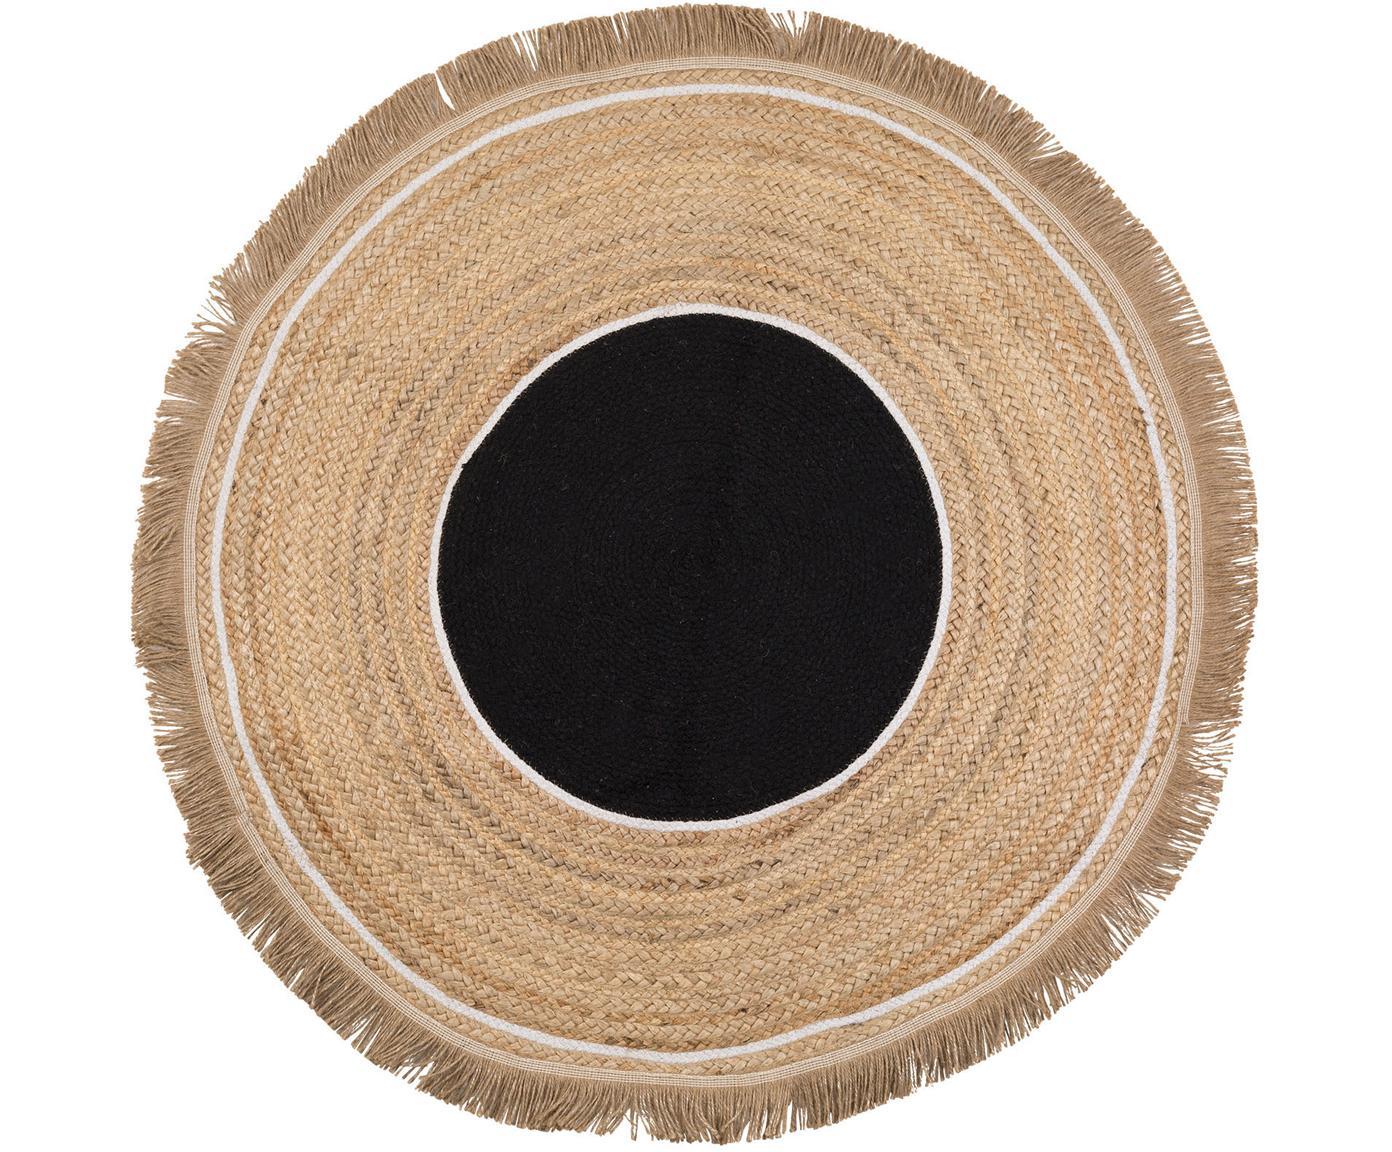 Juten vloerkleed Boham, Jute, katoen, Jutekleurig, zwart, wit, Ø 100 cm